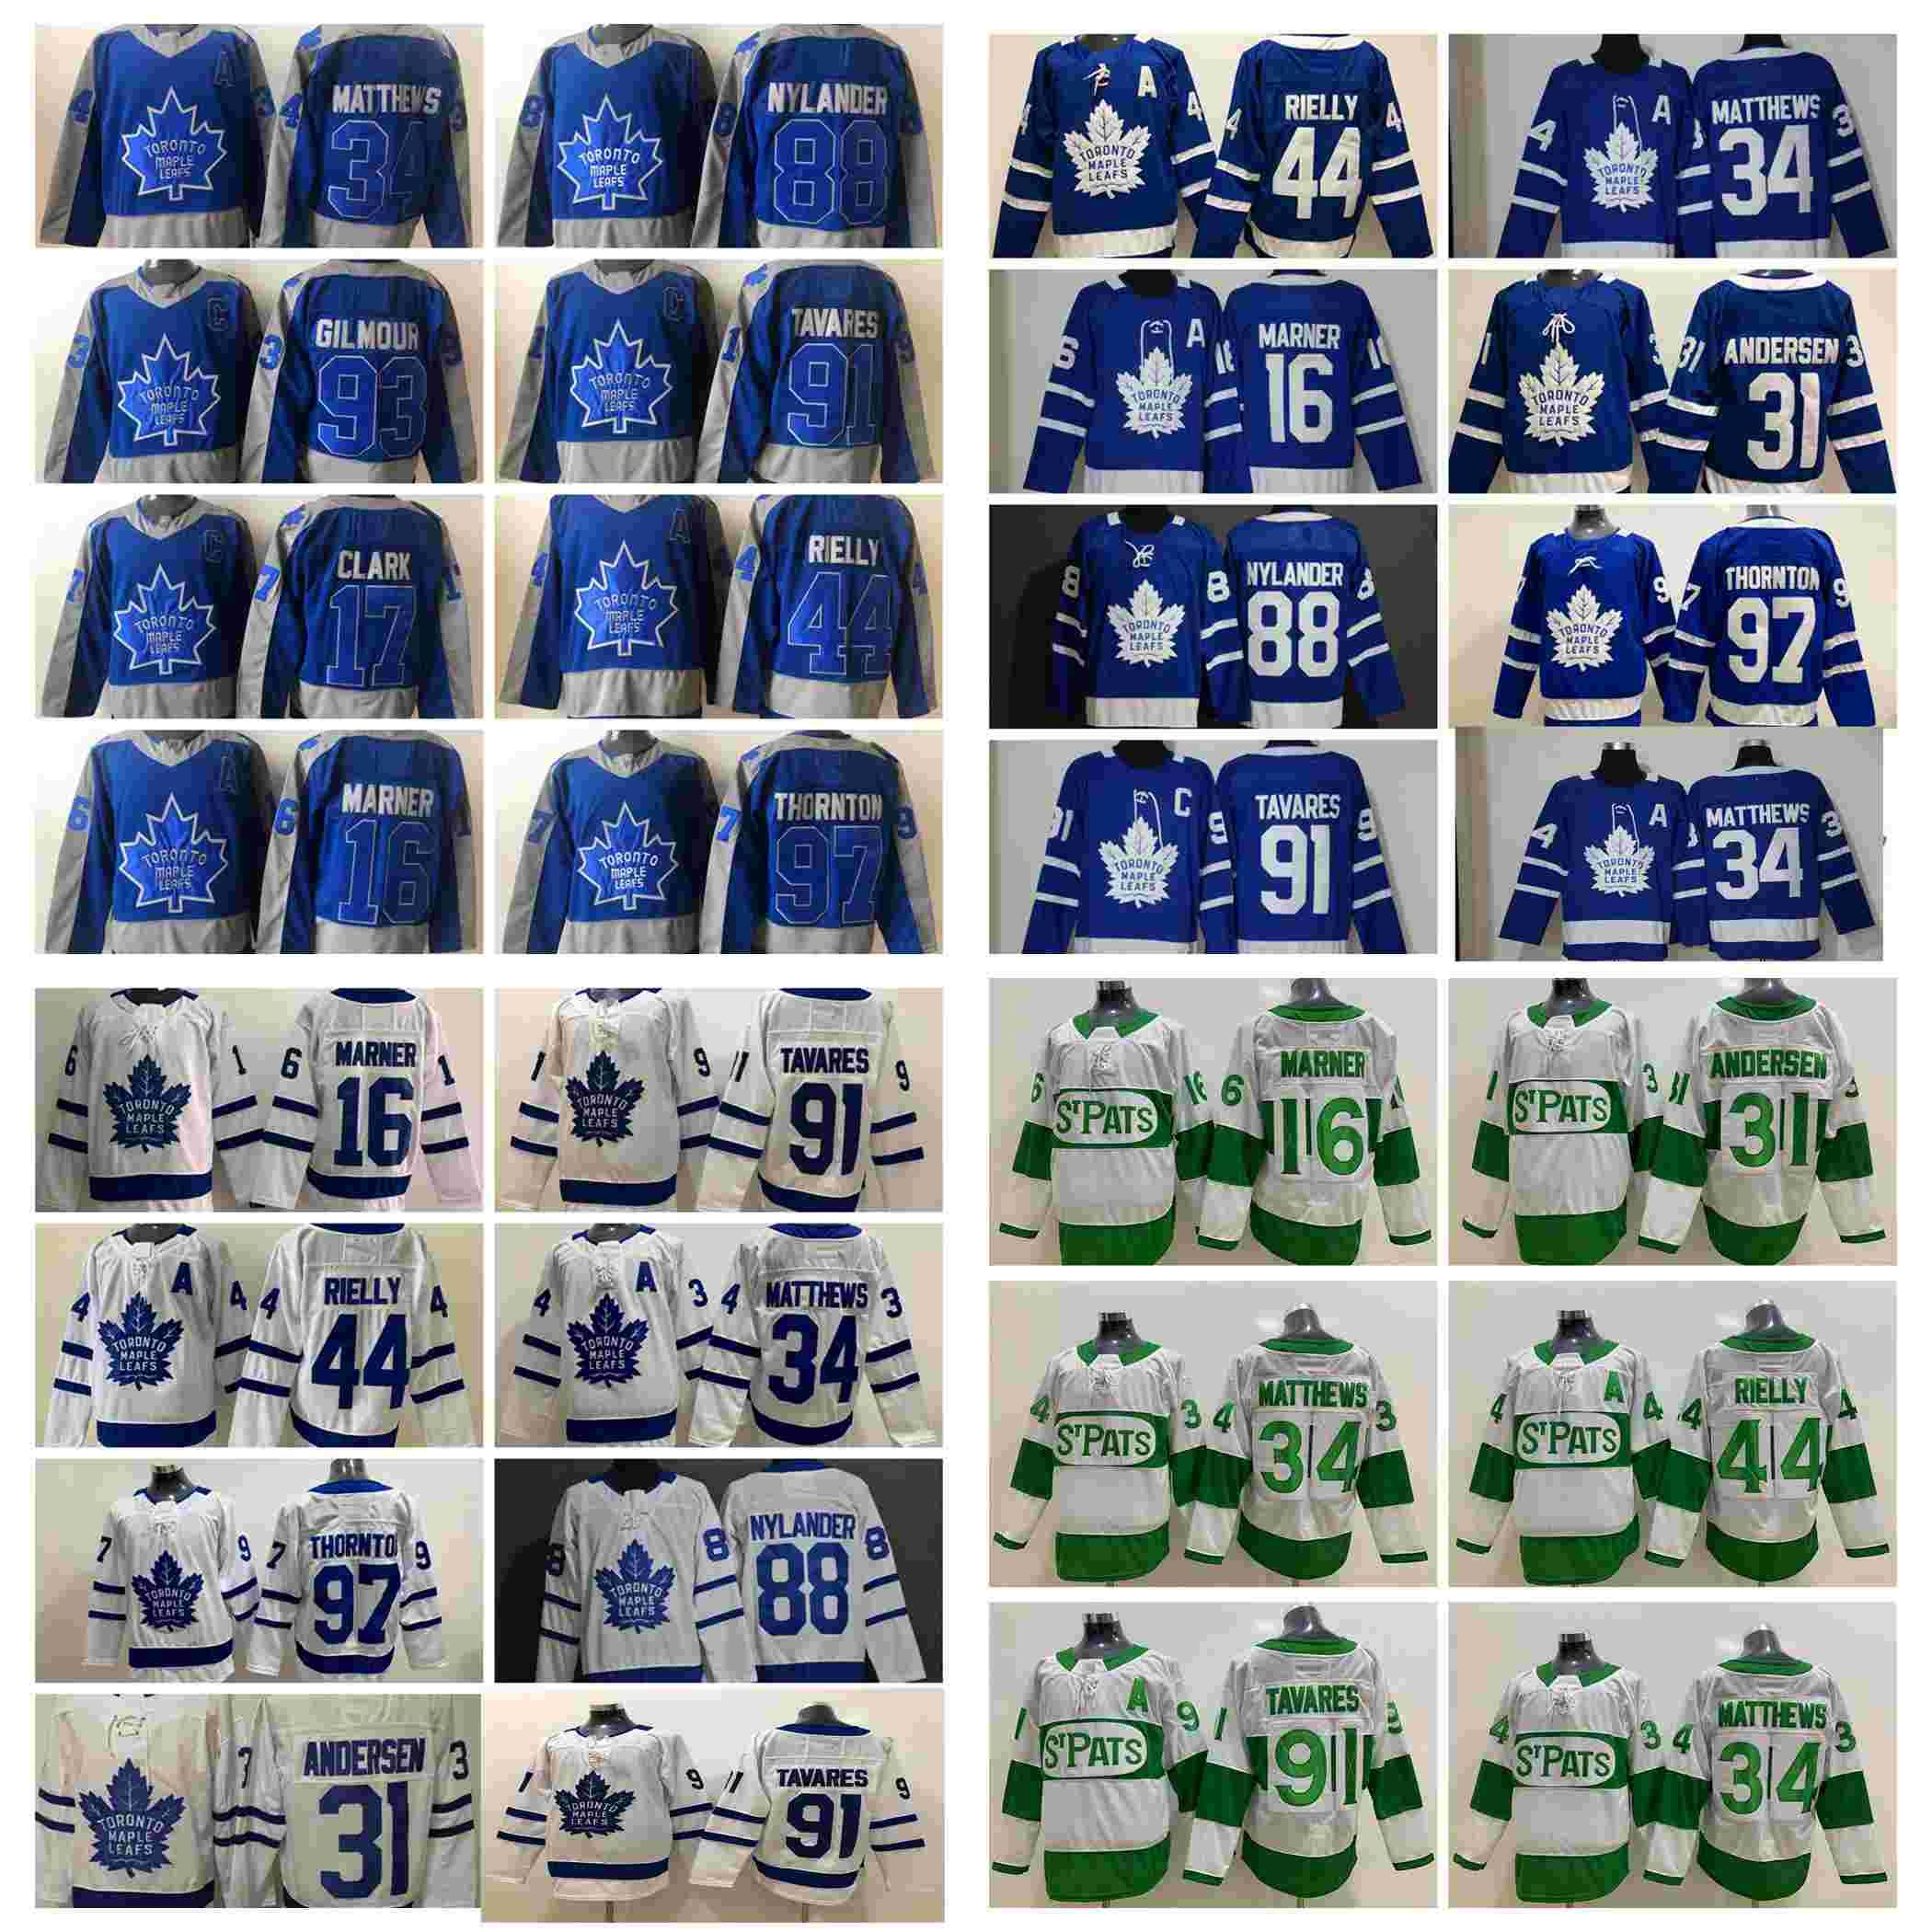 2021 Toronto Maple Leafs Hóquei Jerseys Mens Auston Matthews Jersey Mitchell Marner Jack Campbell Joe Thornton John Tavares William Nylander Costurado